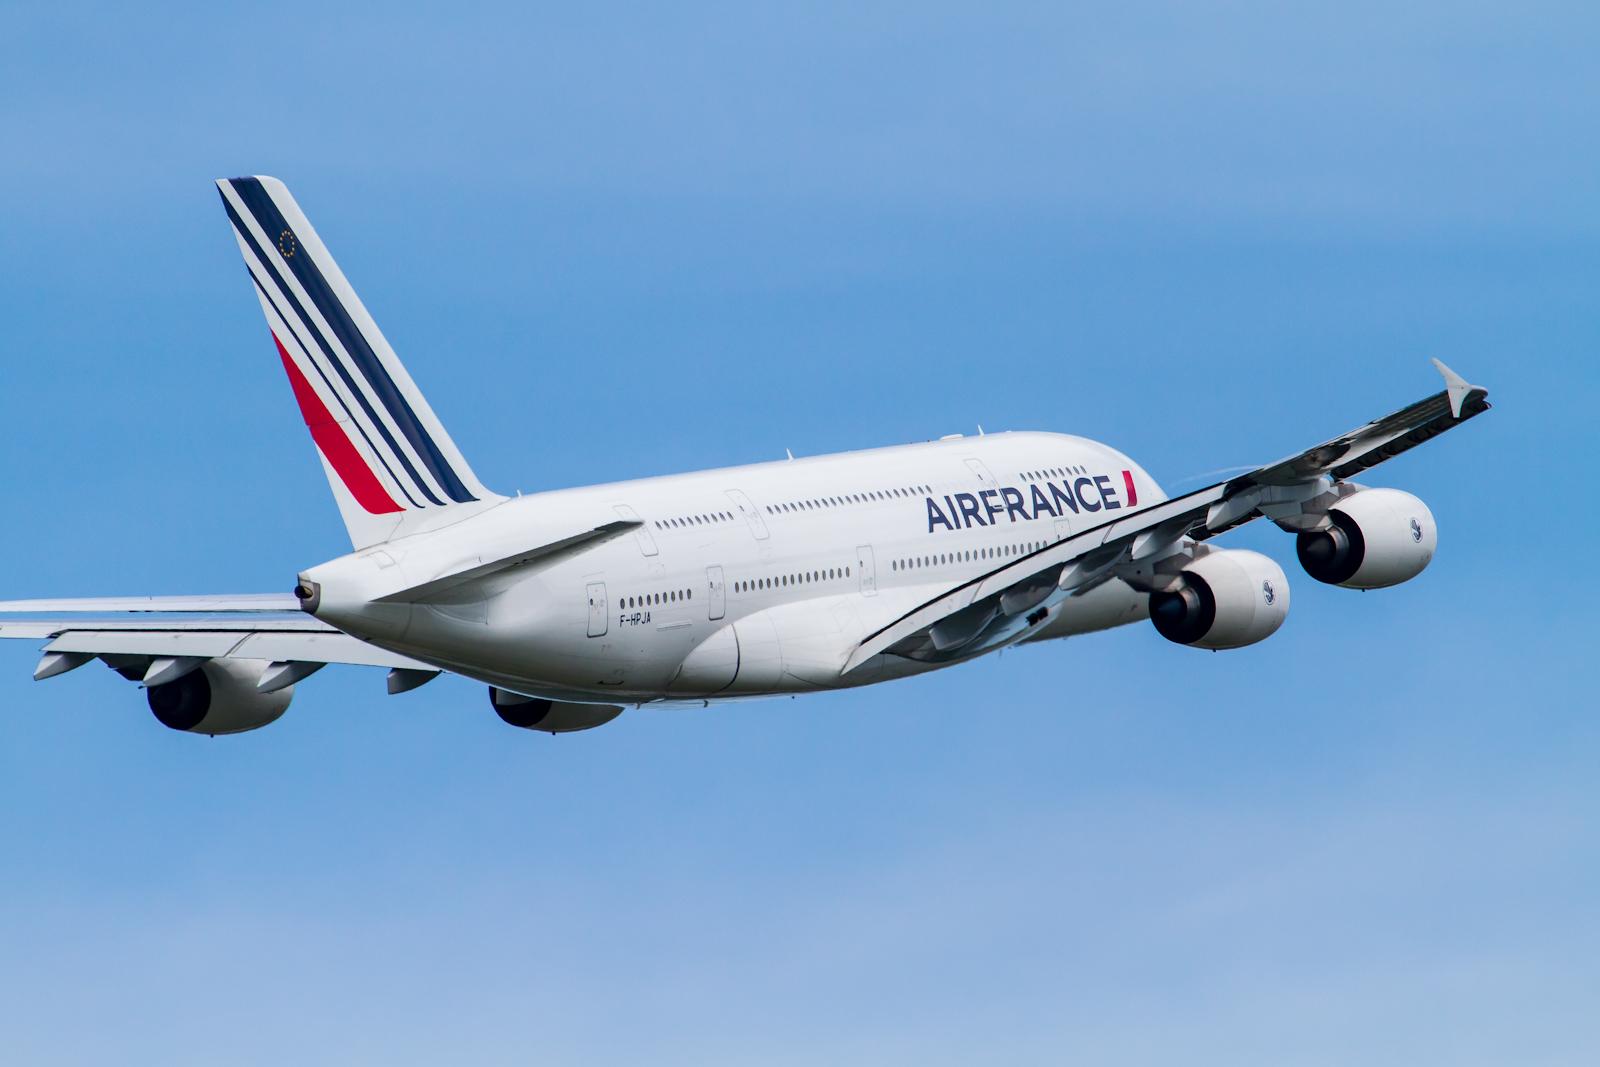 AFR A380-800 'AF275' take off from R/W16R(5).par Ken H sous (CC BY-SA 2.0) https://www.flickr.com/photos/fireballsg72/7620034454/